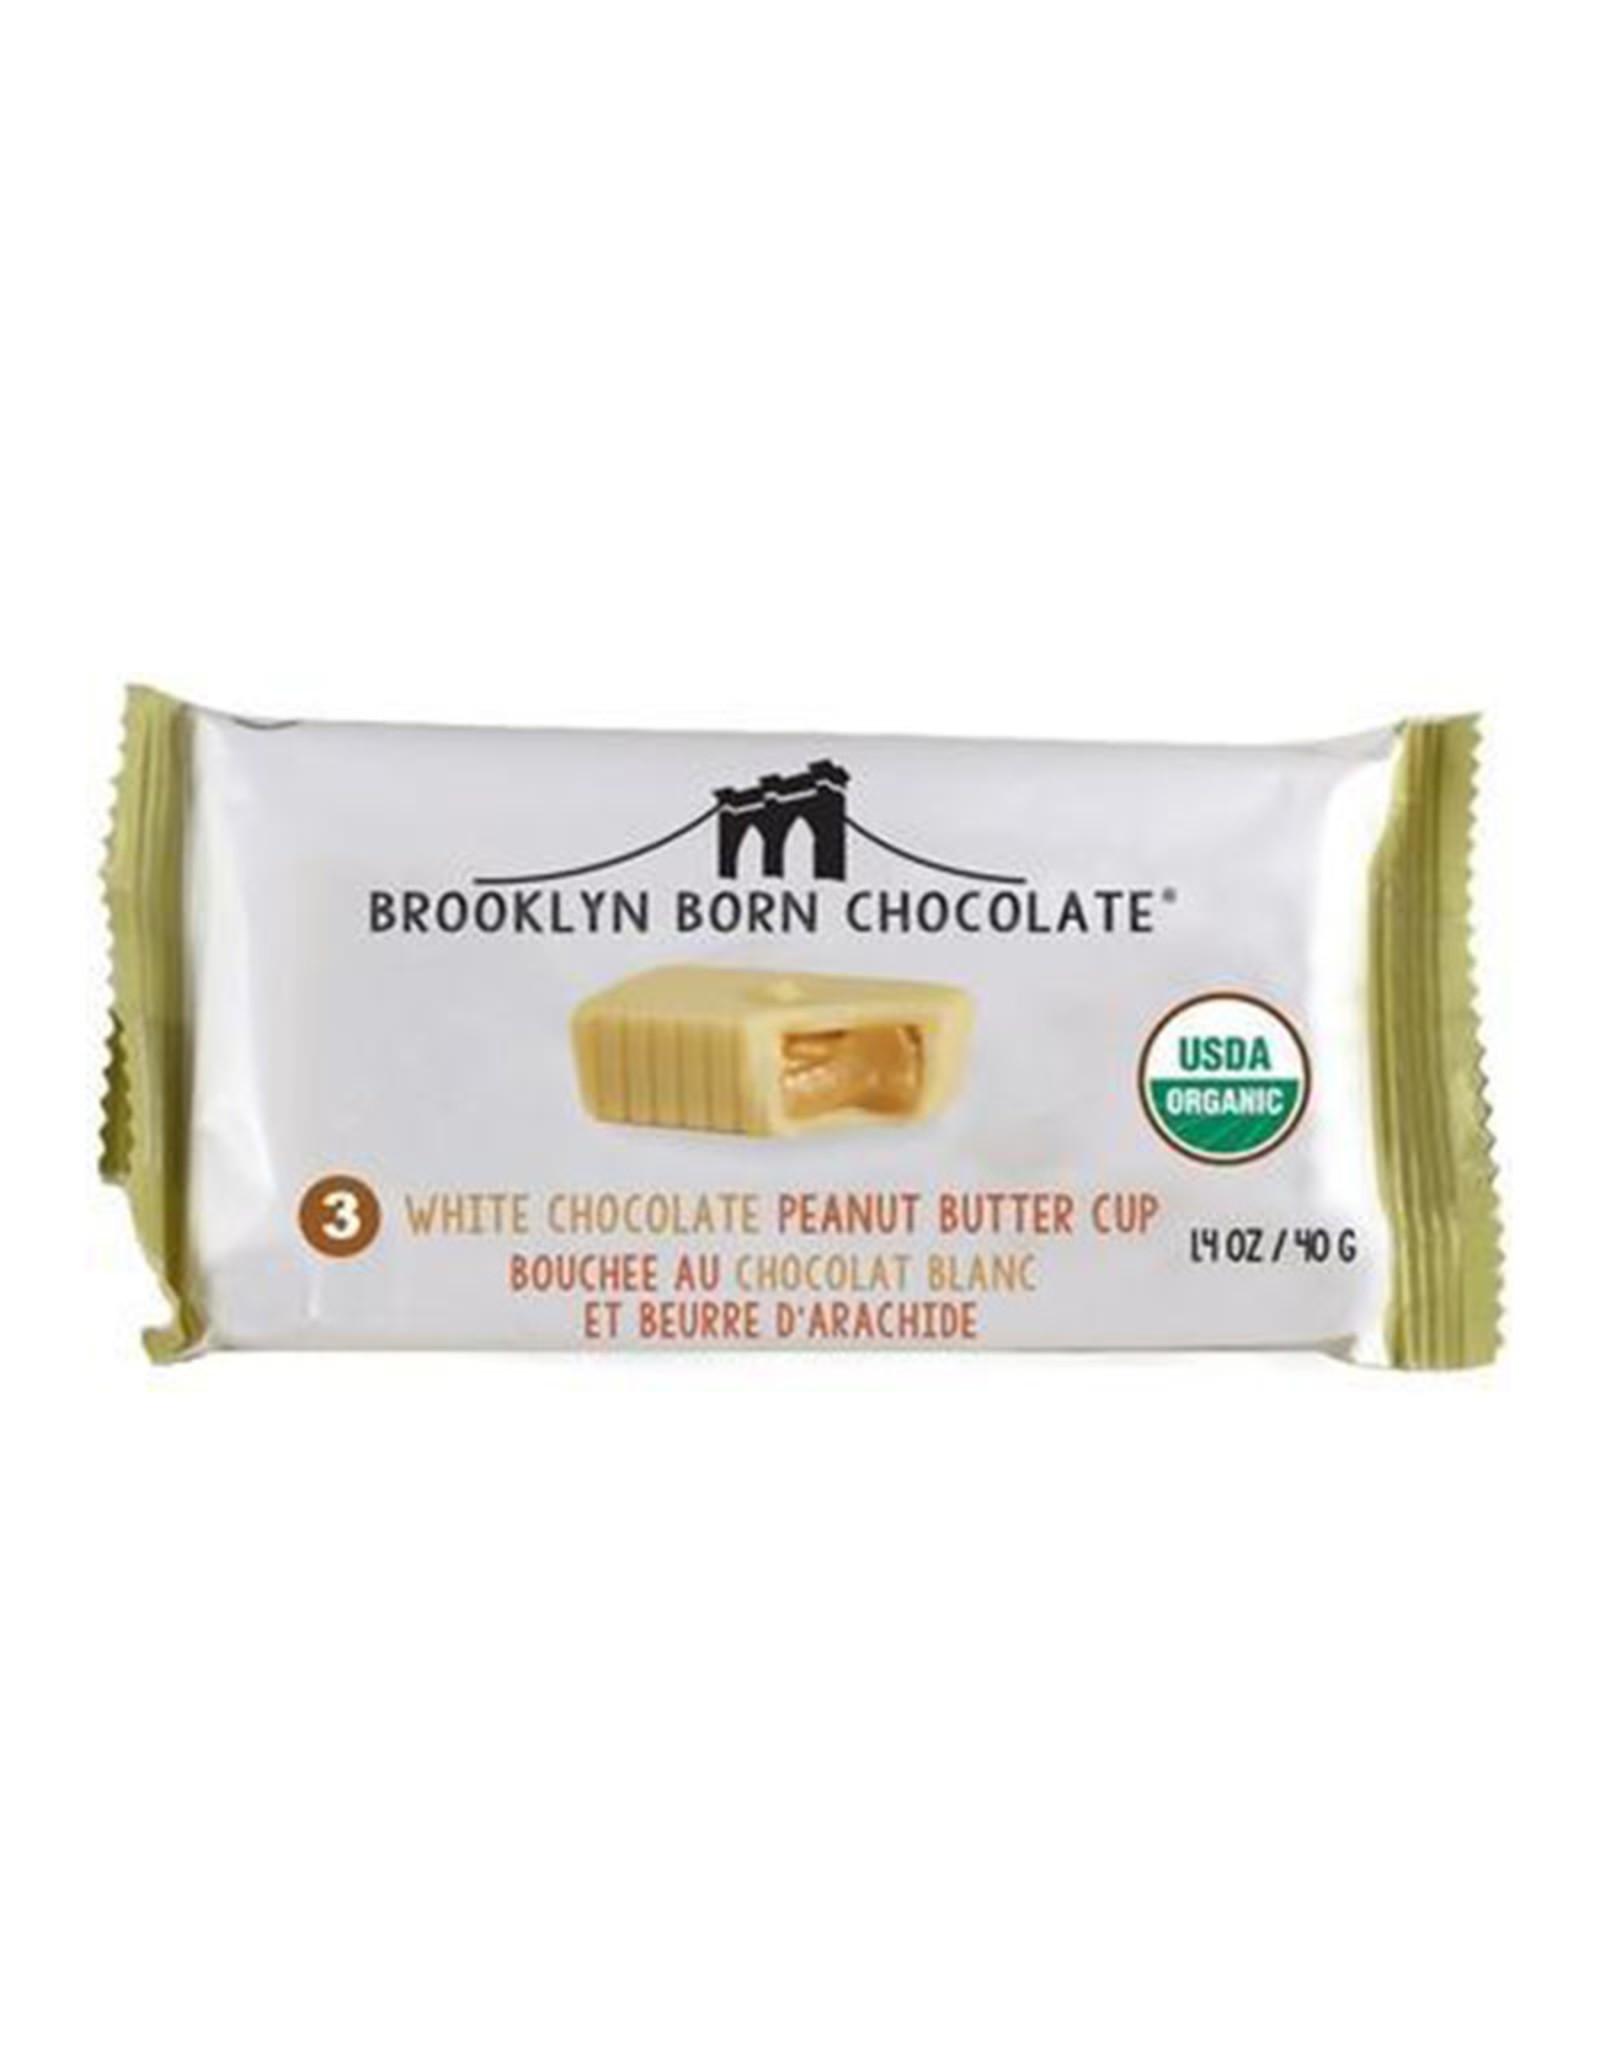 Brooklyn Born Chocolate Brooklyn - Peanut Butter Cups, White Chocolate (70g)